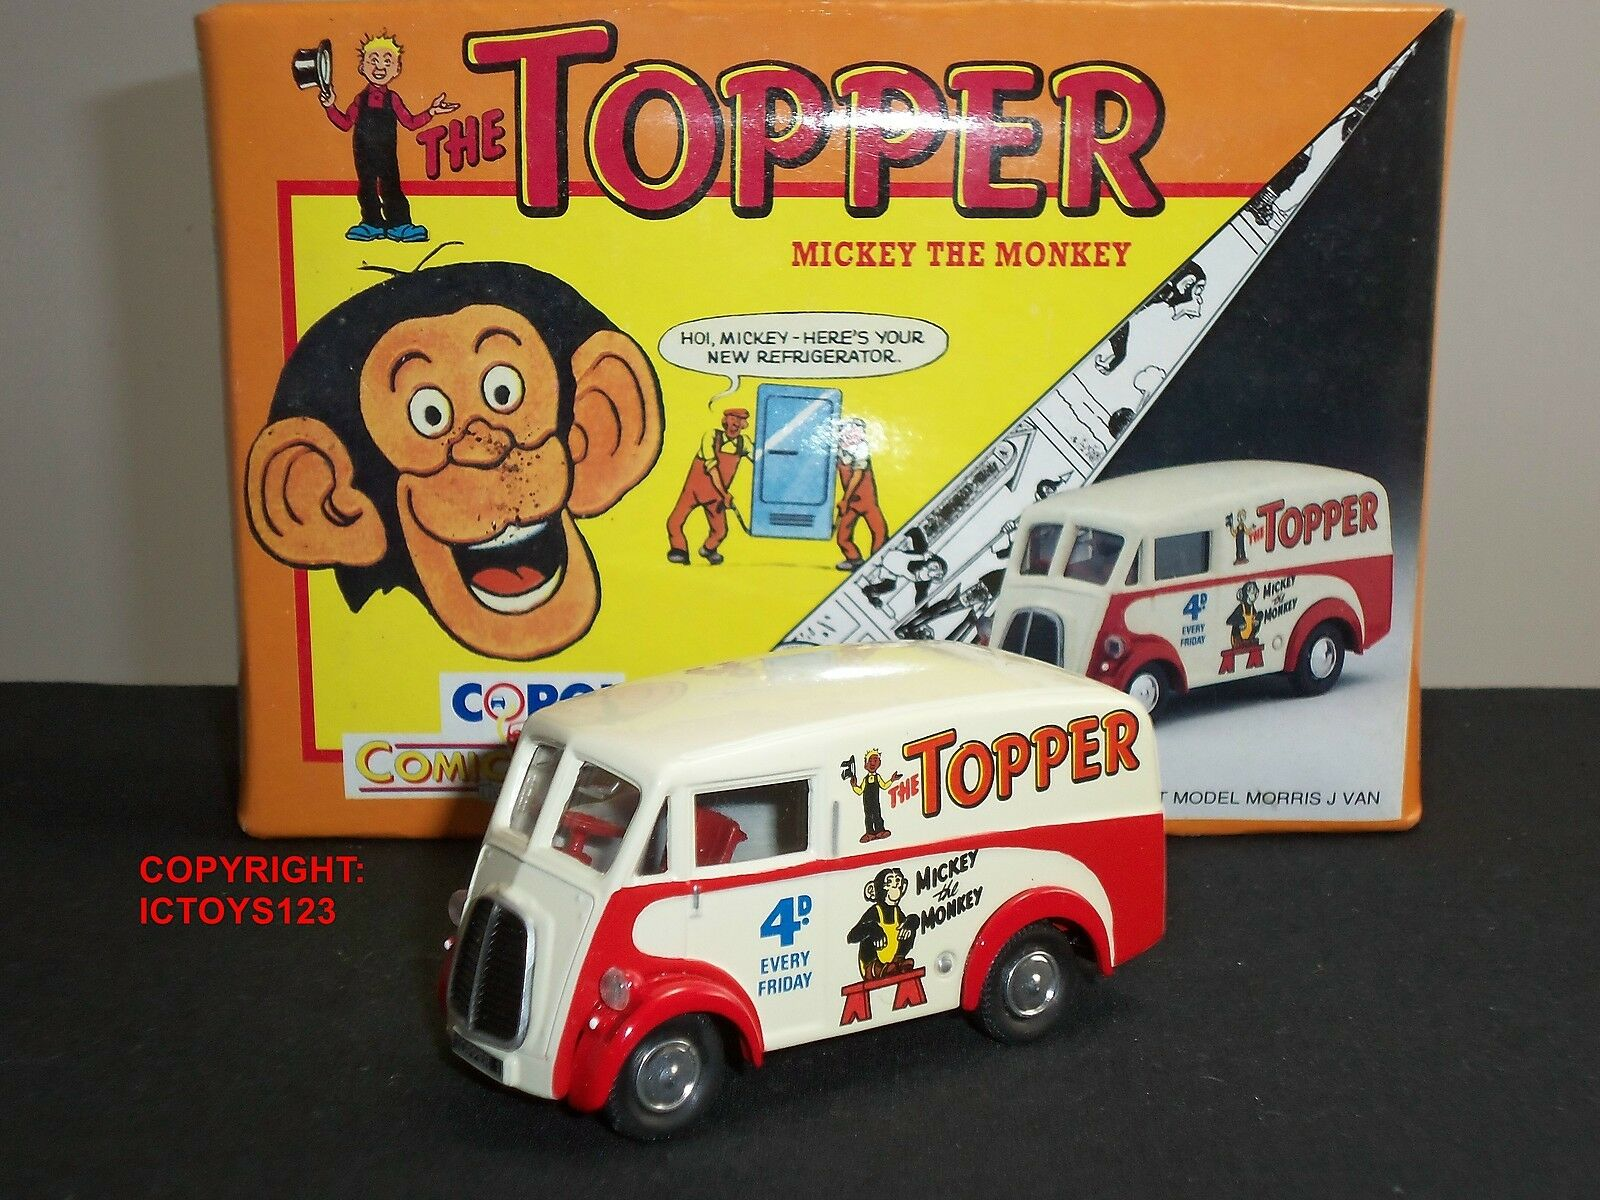 CORGI 96887 TOPPER COMIC ANNUAL MORRIS J DIECAST MODEL DELIVERY VAN